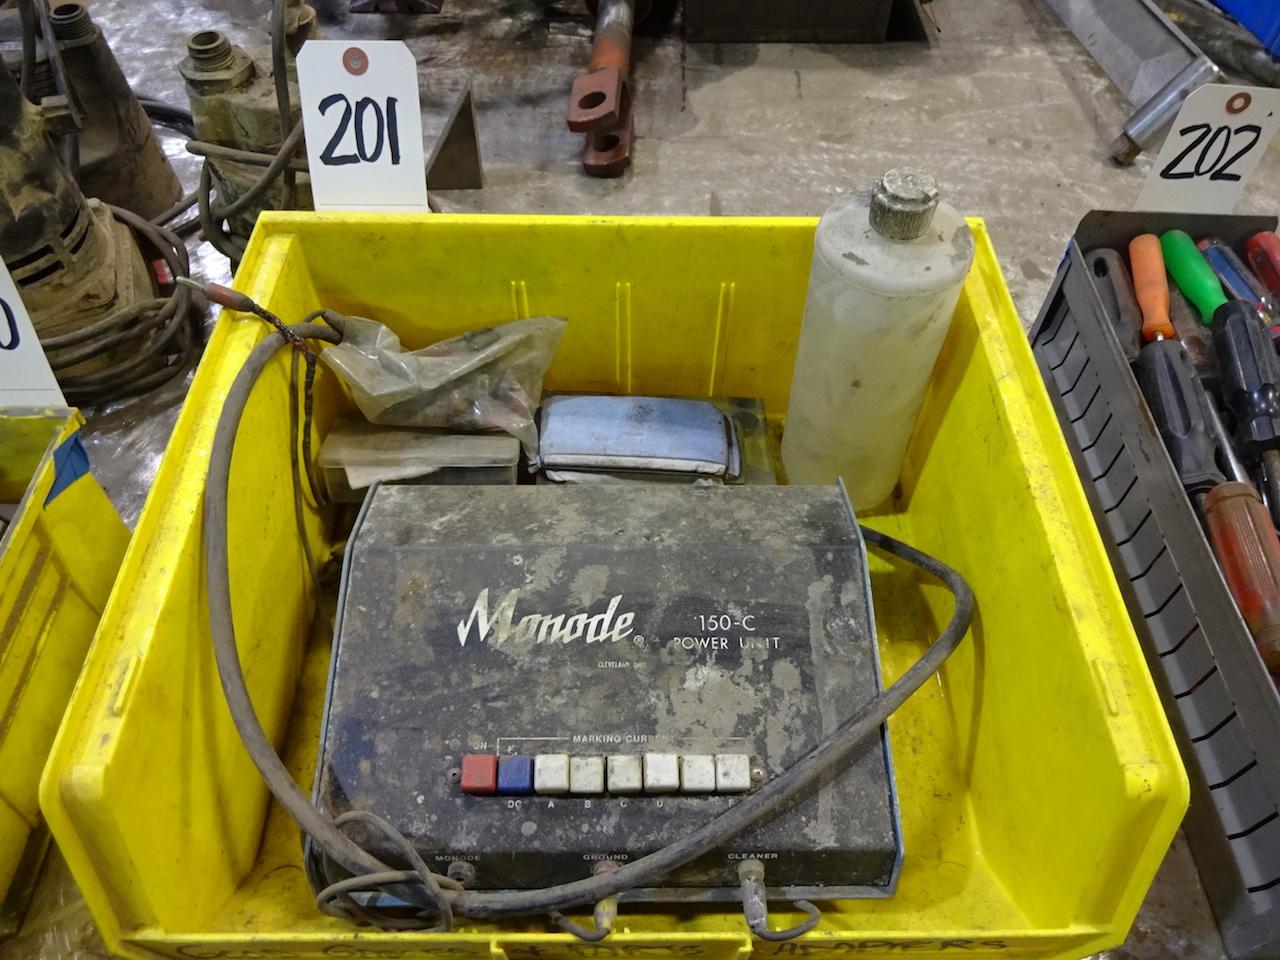 Lot 201 - Monode Model 150-C Power Unit; For Weld Bluing Removal